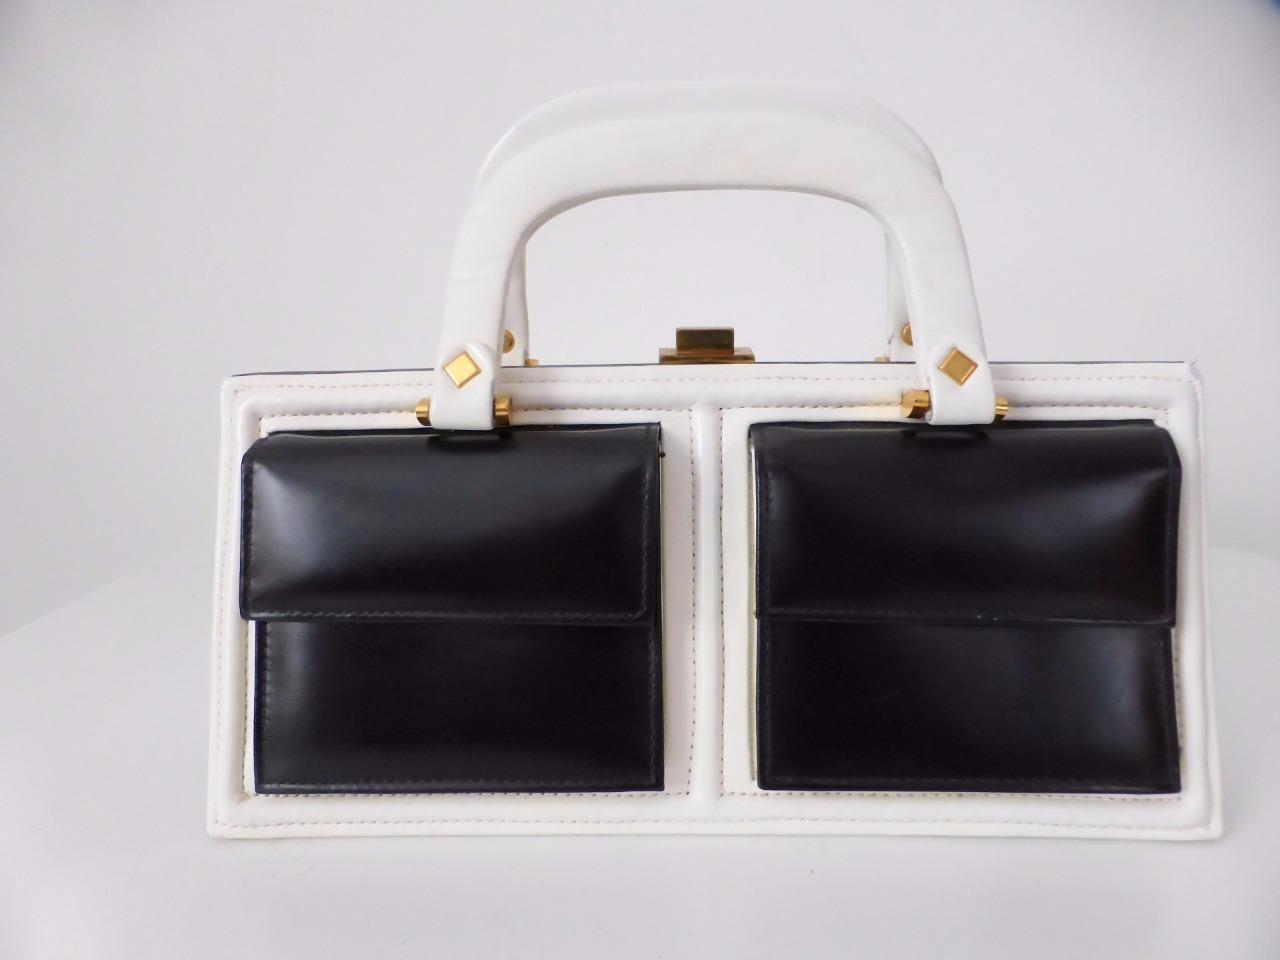 Hollywood Handbags Sydney Australia Vintage Black And White Leather Handbag Ebay